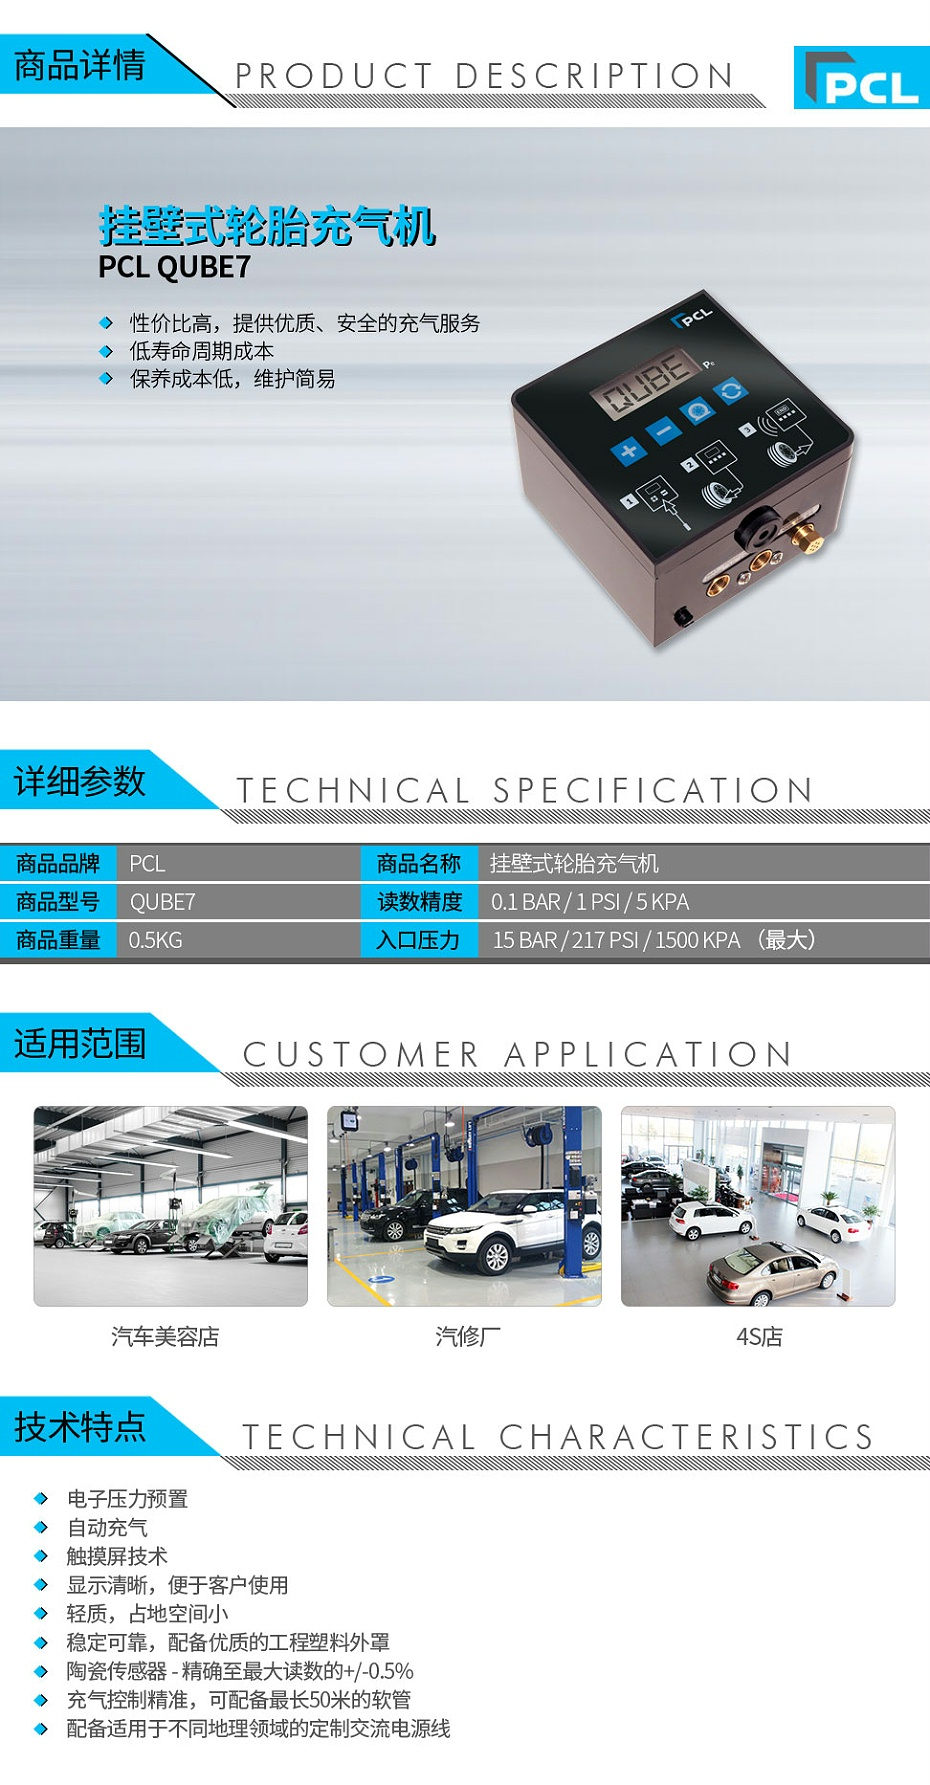 PCL-QUBE7-挂壁式轮胎充气机